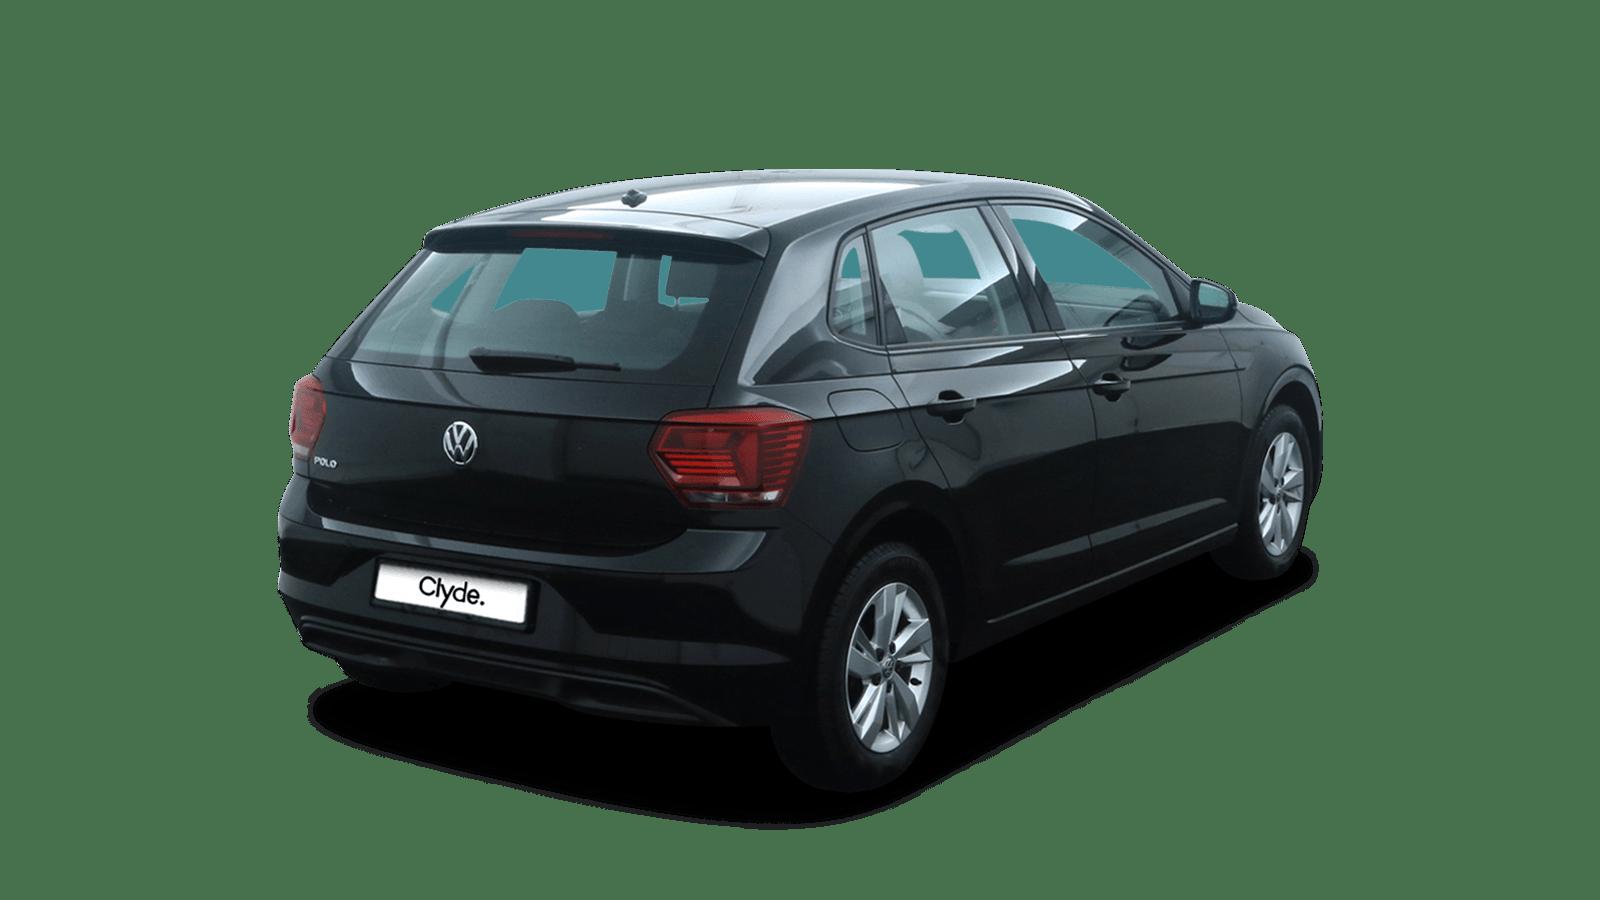 VW Polo Black back - Clyde car subscription